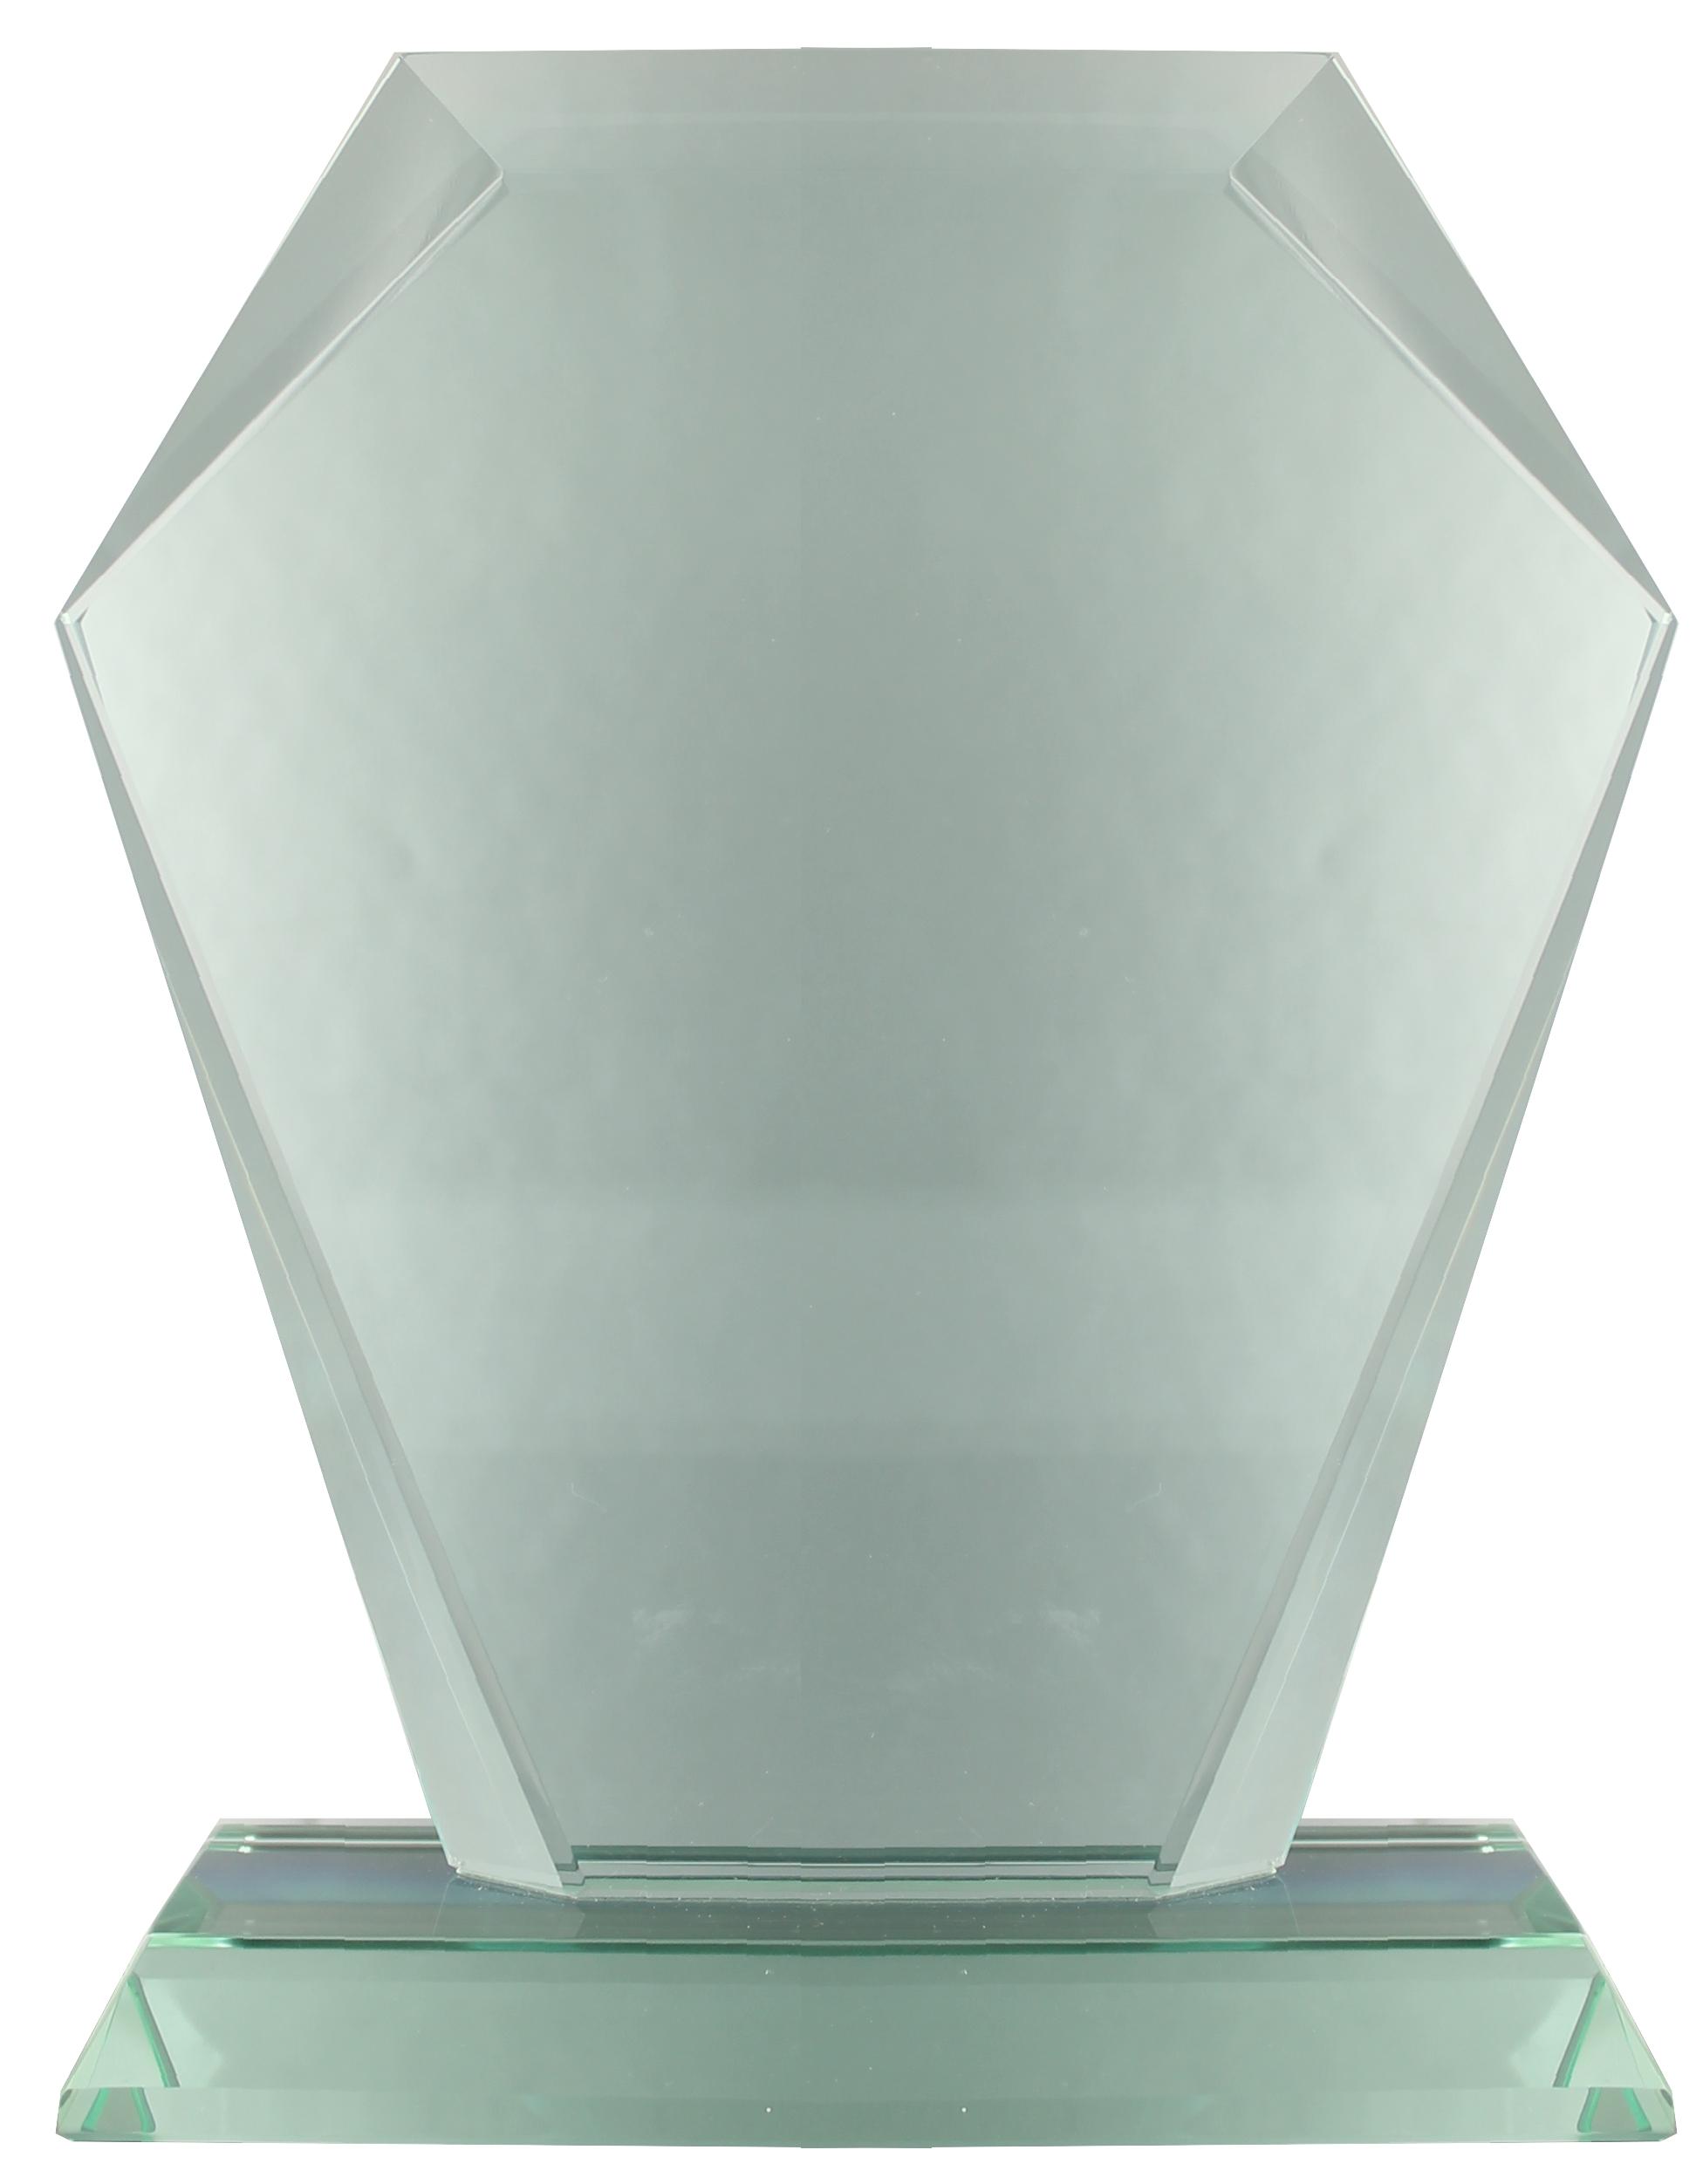 GL76 Jade Glass Kite Plaque Image